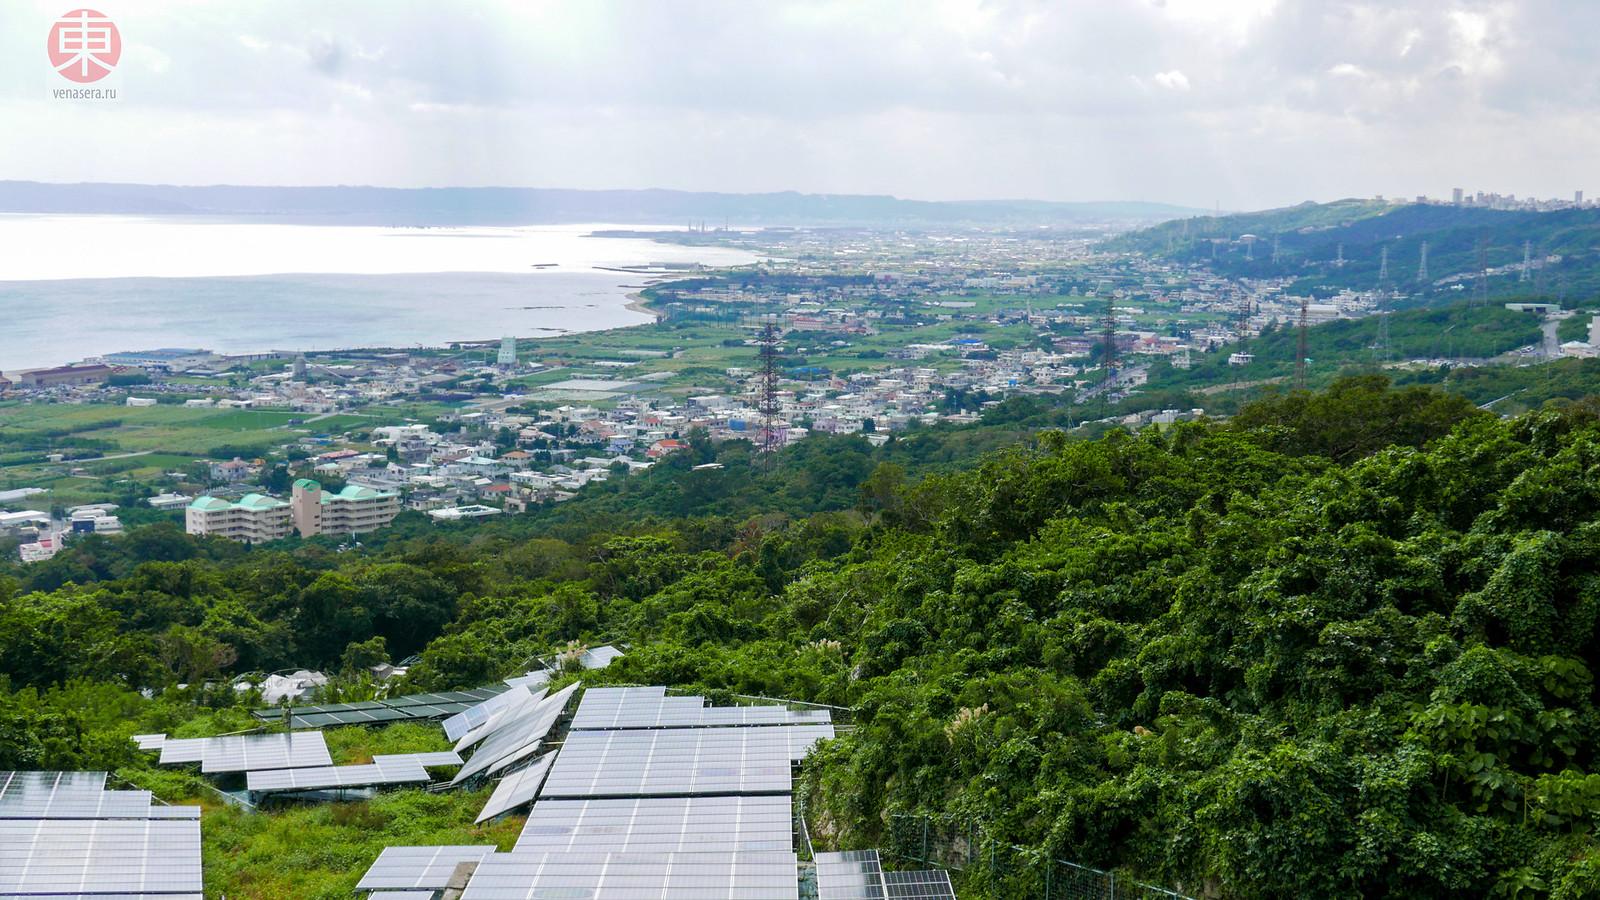 Развалины Замка Накагусуку, Окинава, Япония